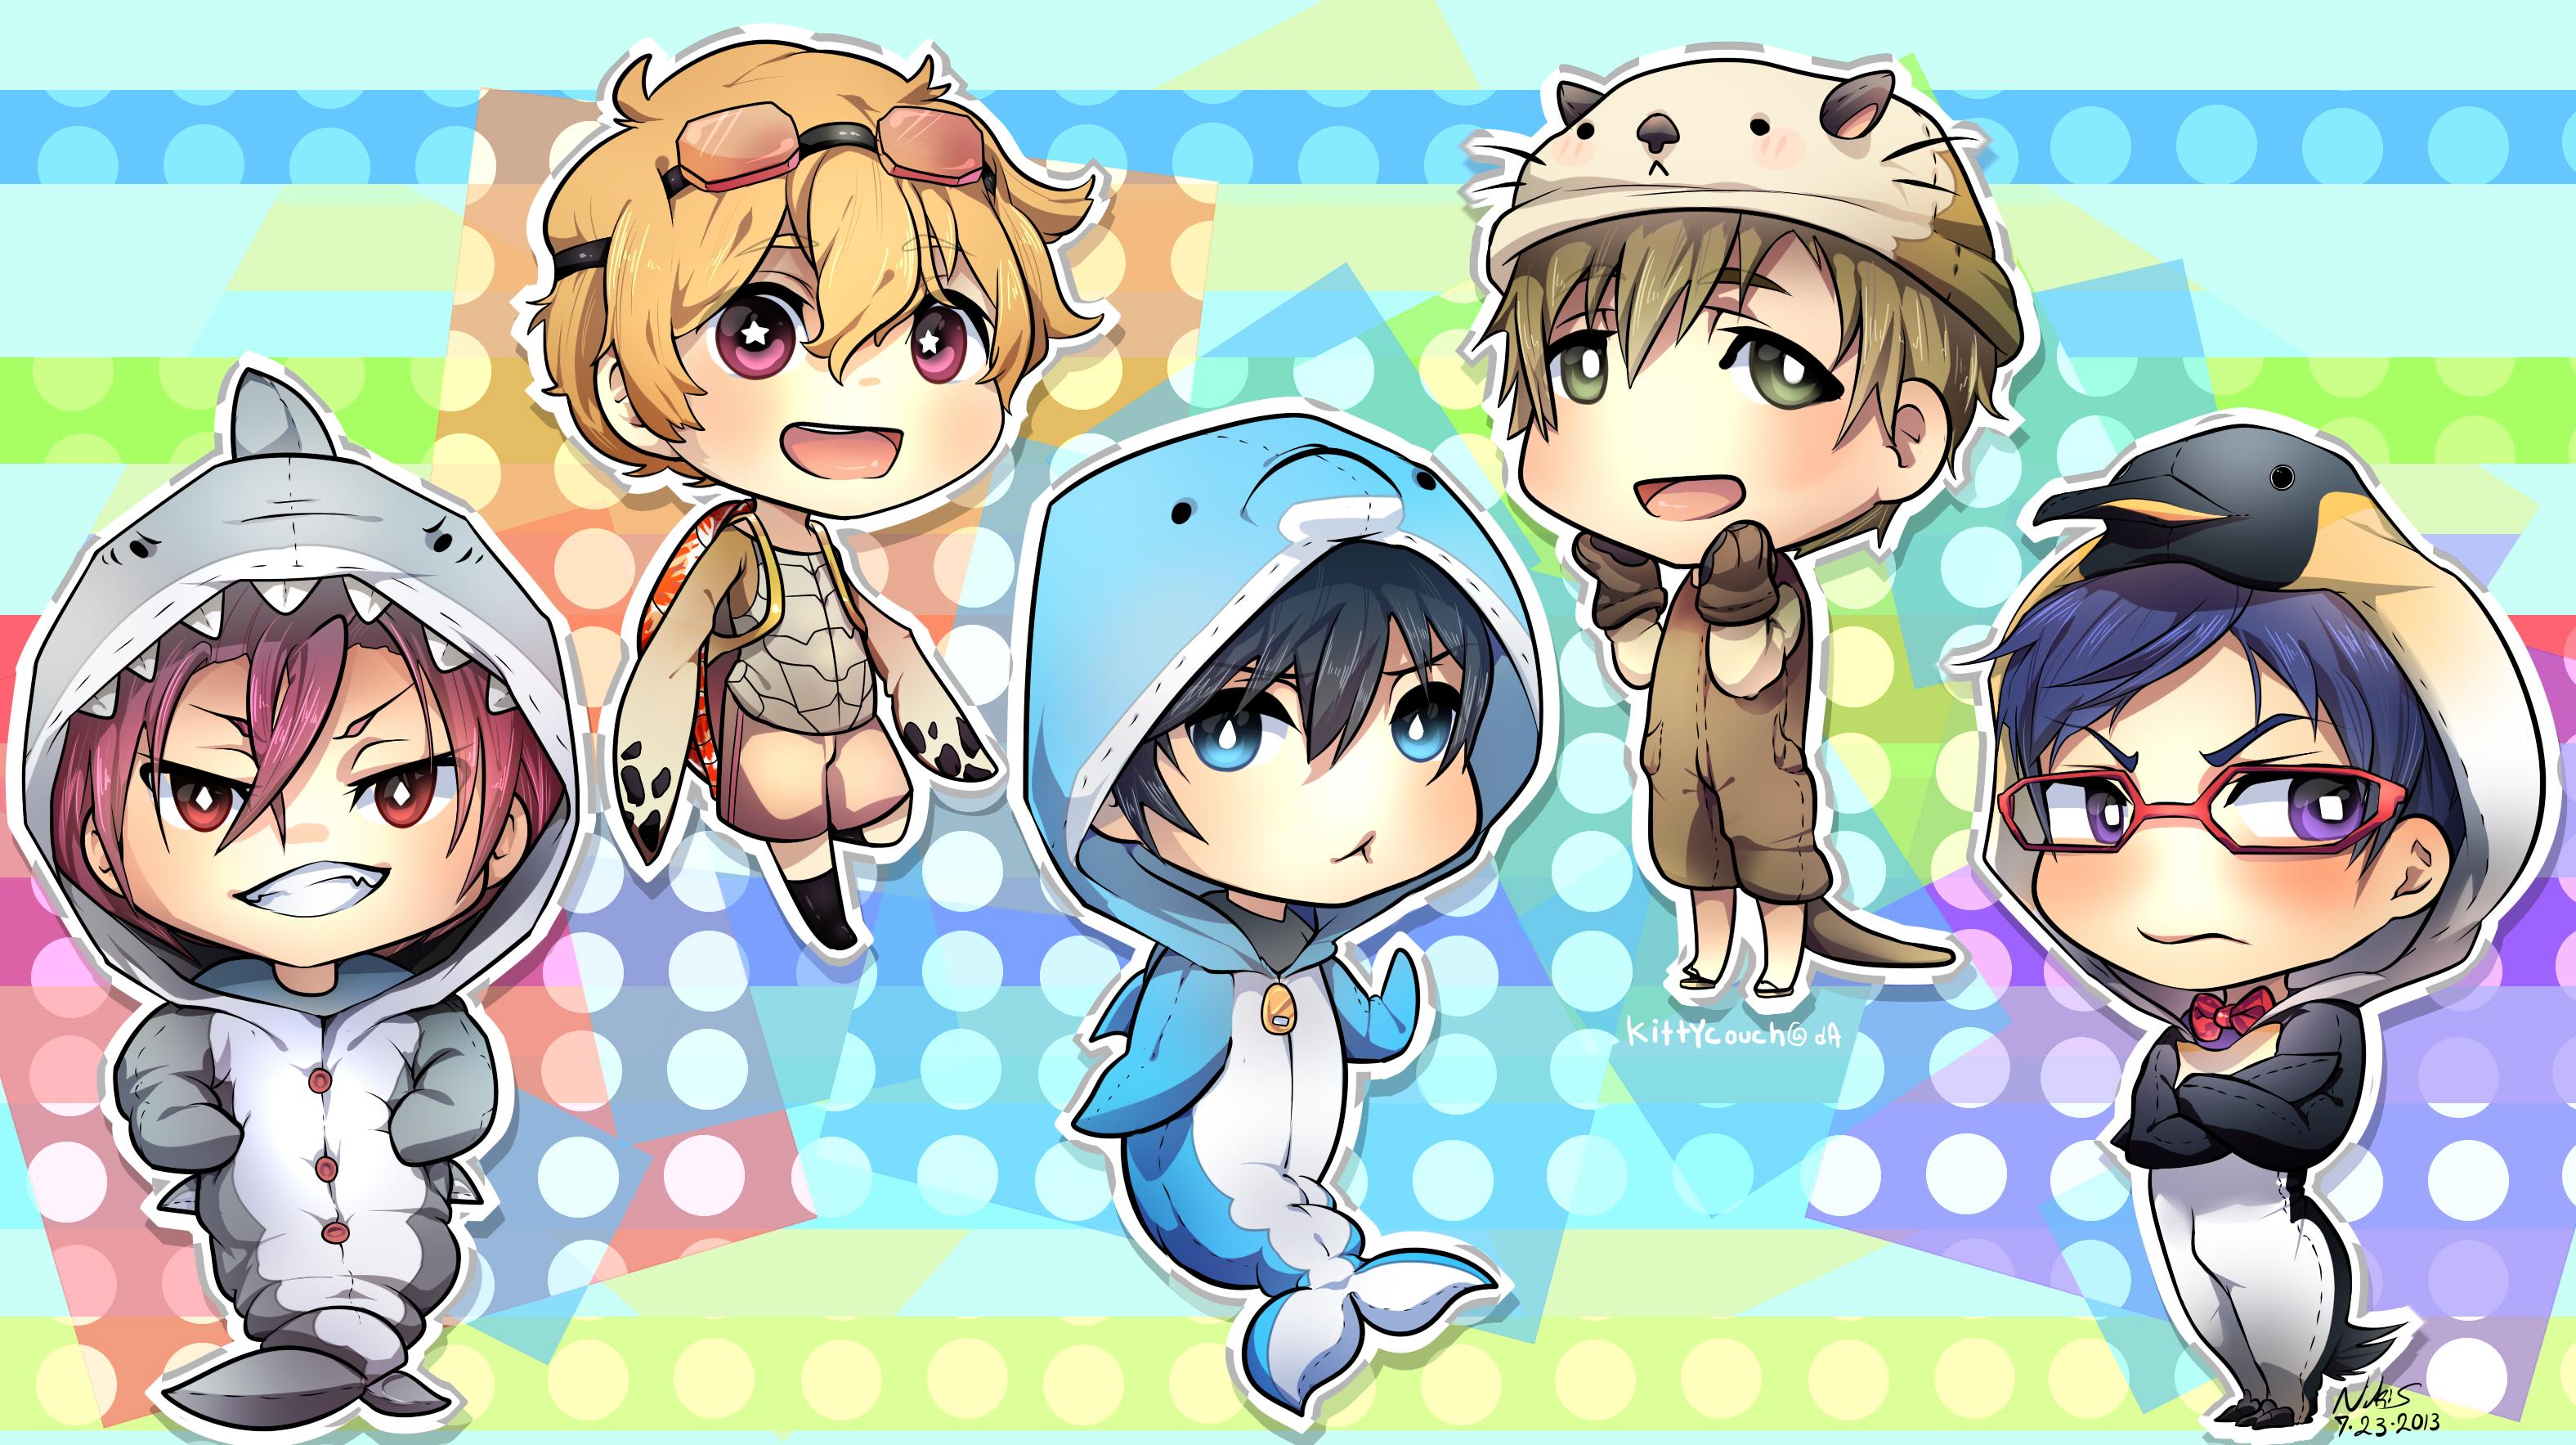 Free! Iwatobi Swim Club Wallpaper.